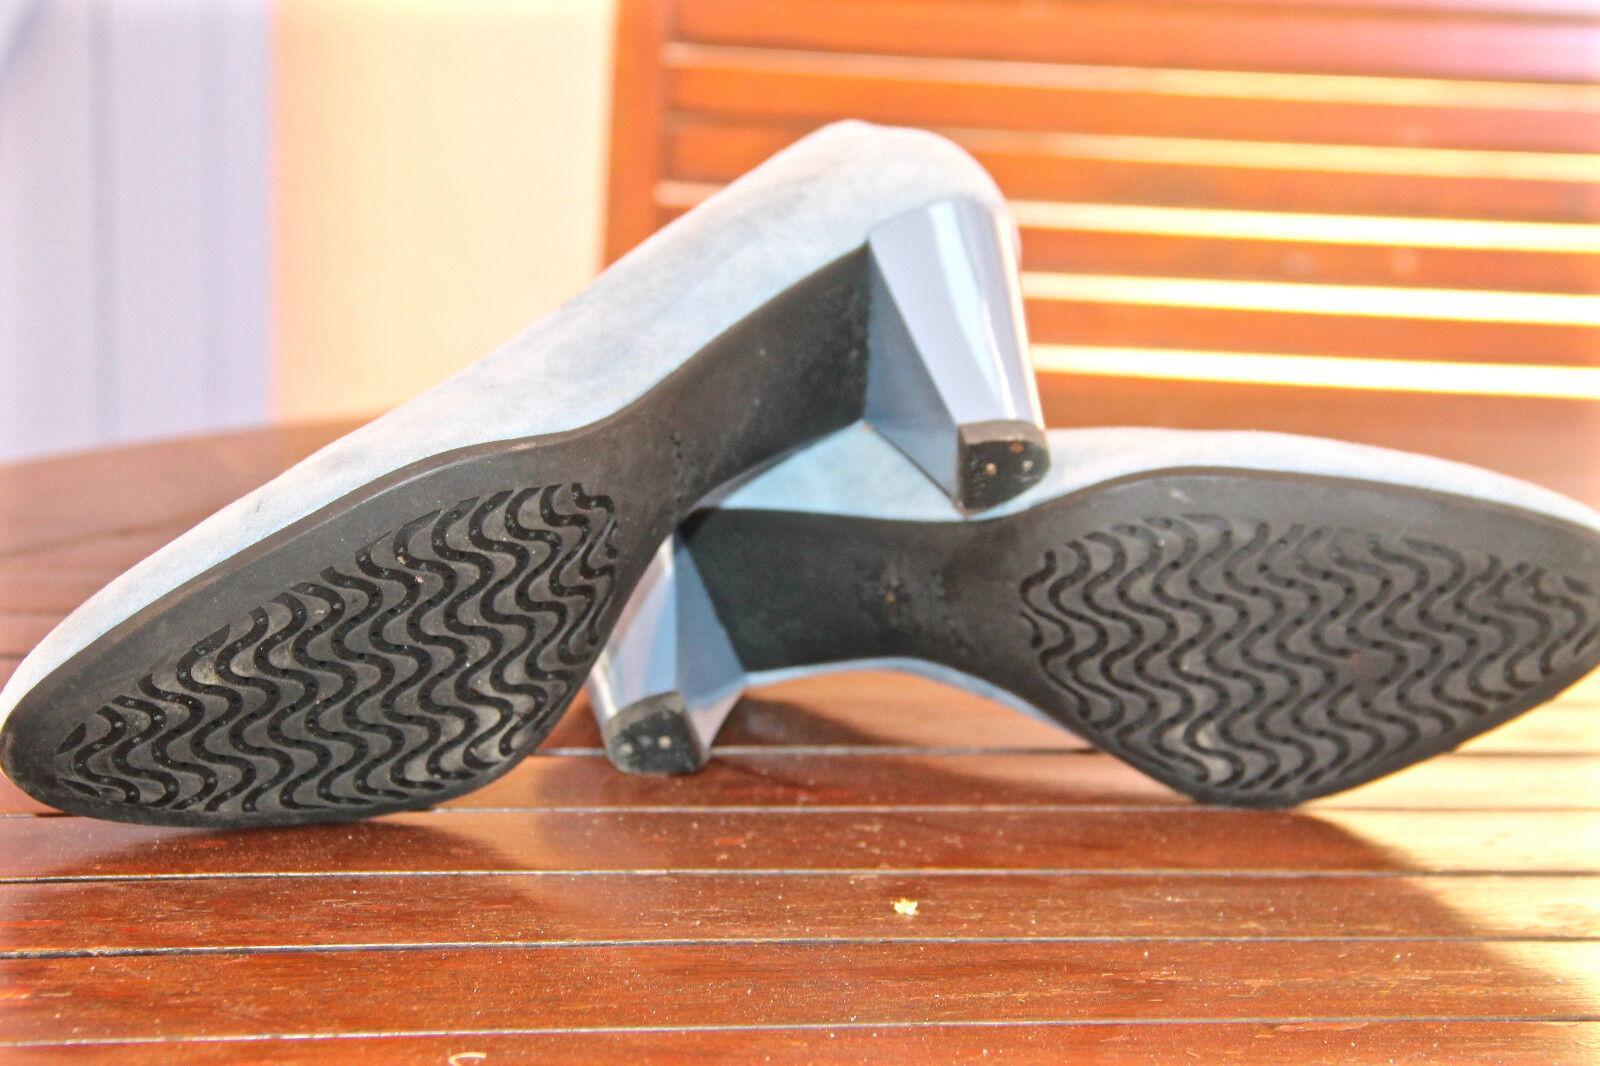 Jolis escarpins en cuir daim RESPIRA bleu 80 mm GEOX RESPIRA daim pointure 40 QUASI NEUFS d8516c